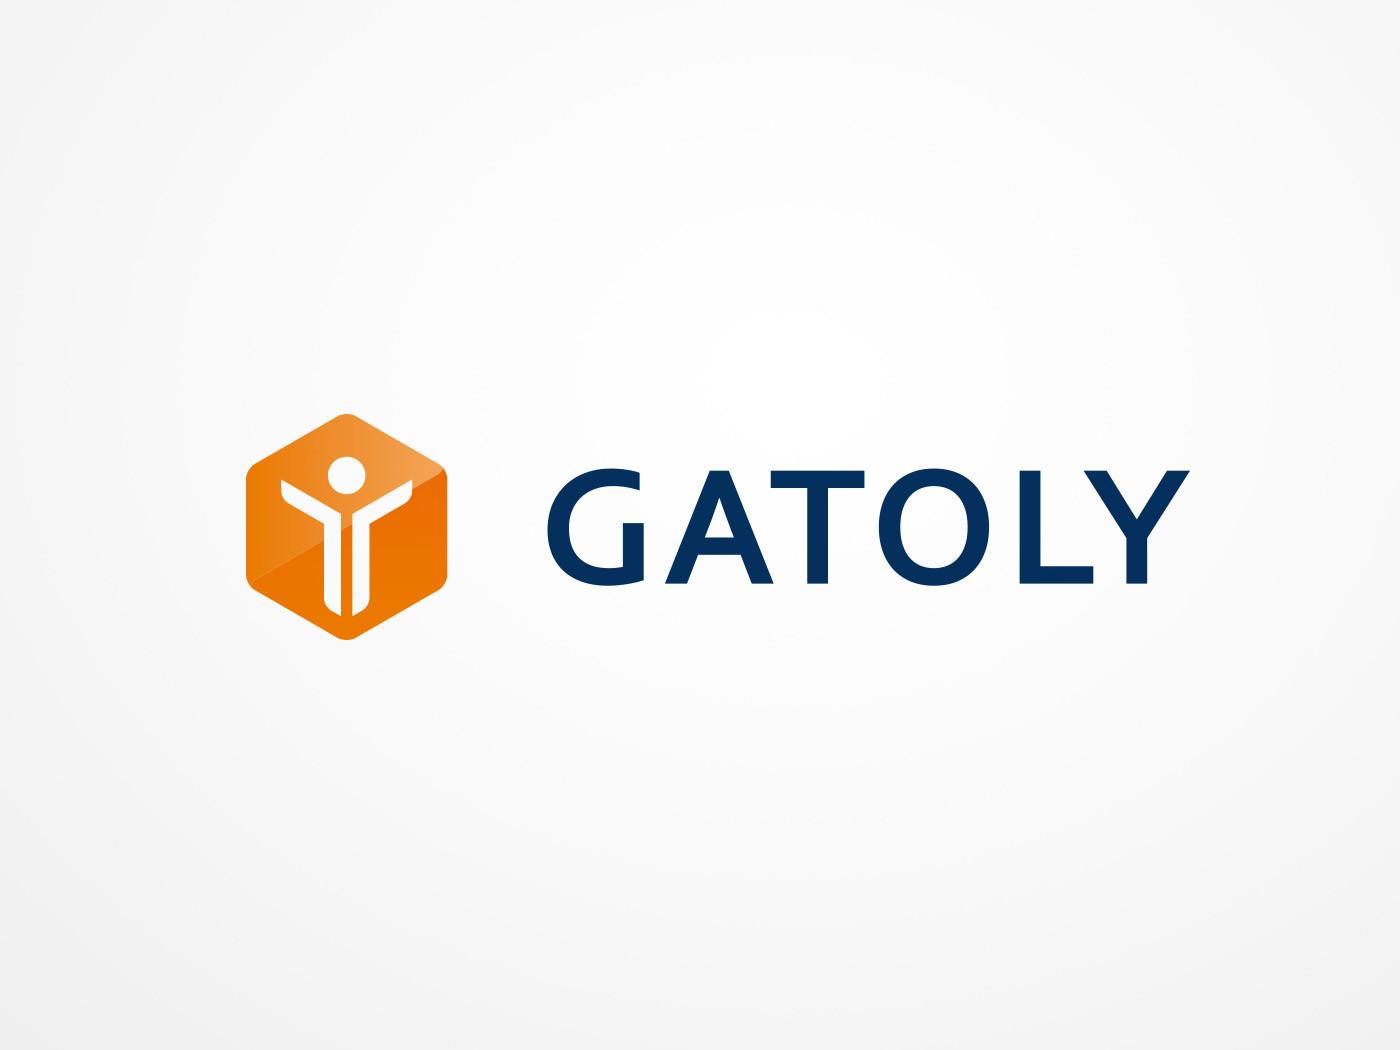 Logogestaltung_Gatoly.jpg